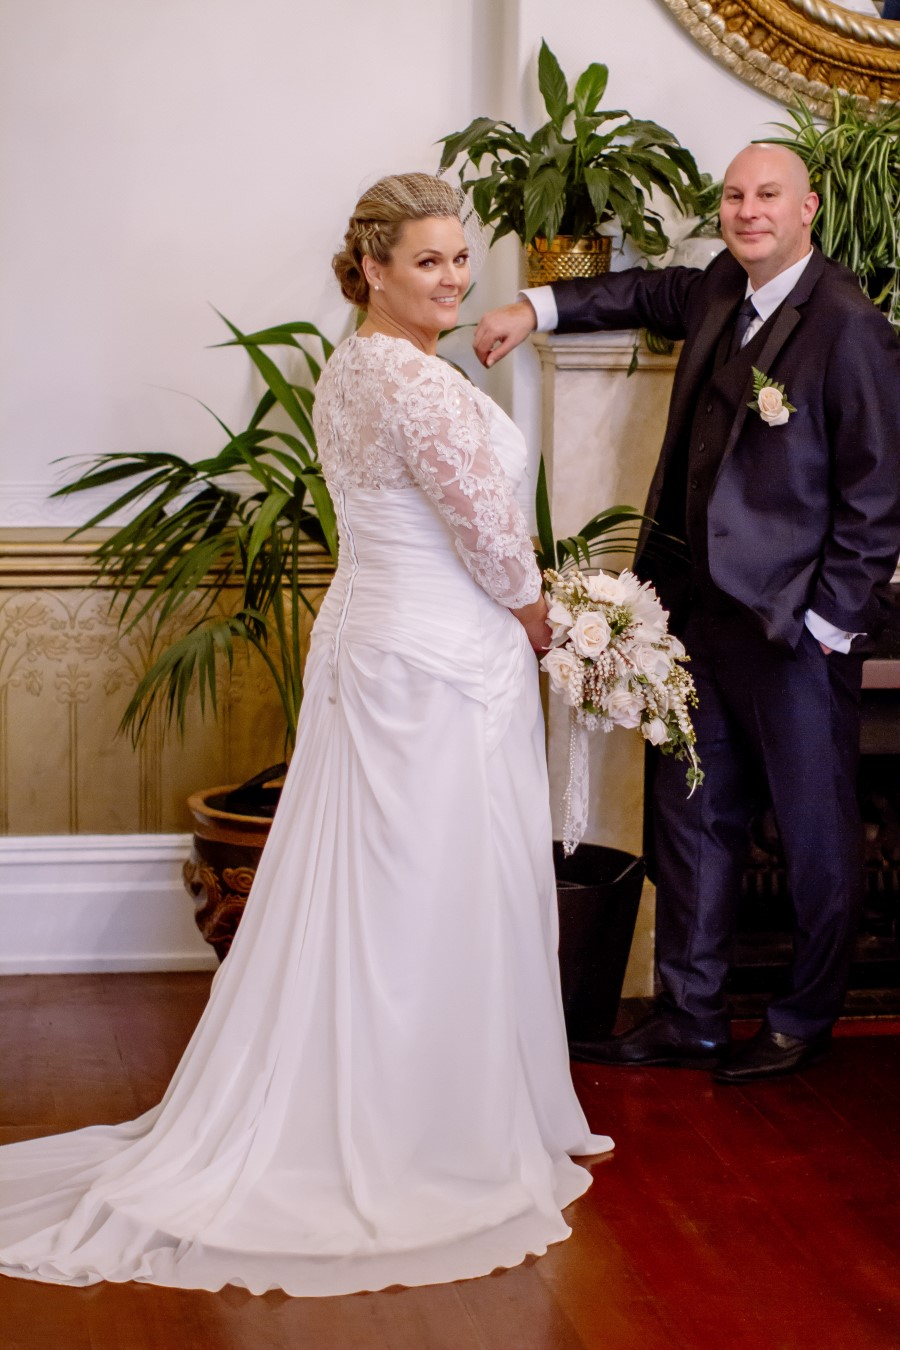 nz_wedding_st_leonards_mchughs-757